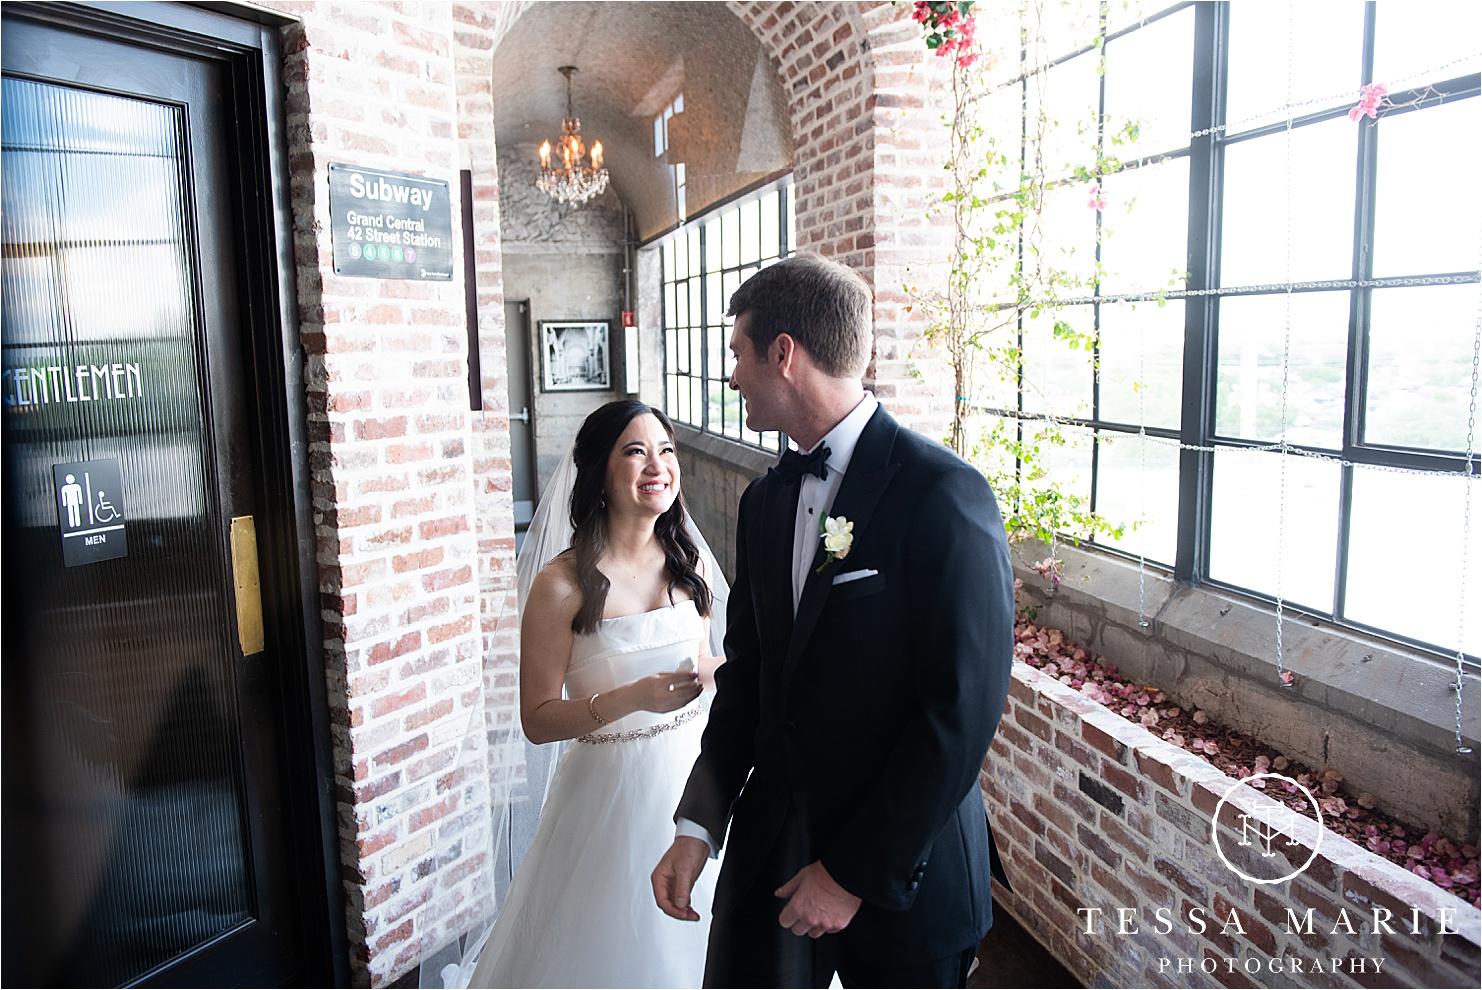 Tessa_marie_weddings_houston_wedding_photographer_The_astorian_0049.jpg